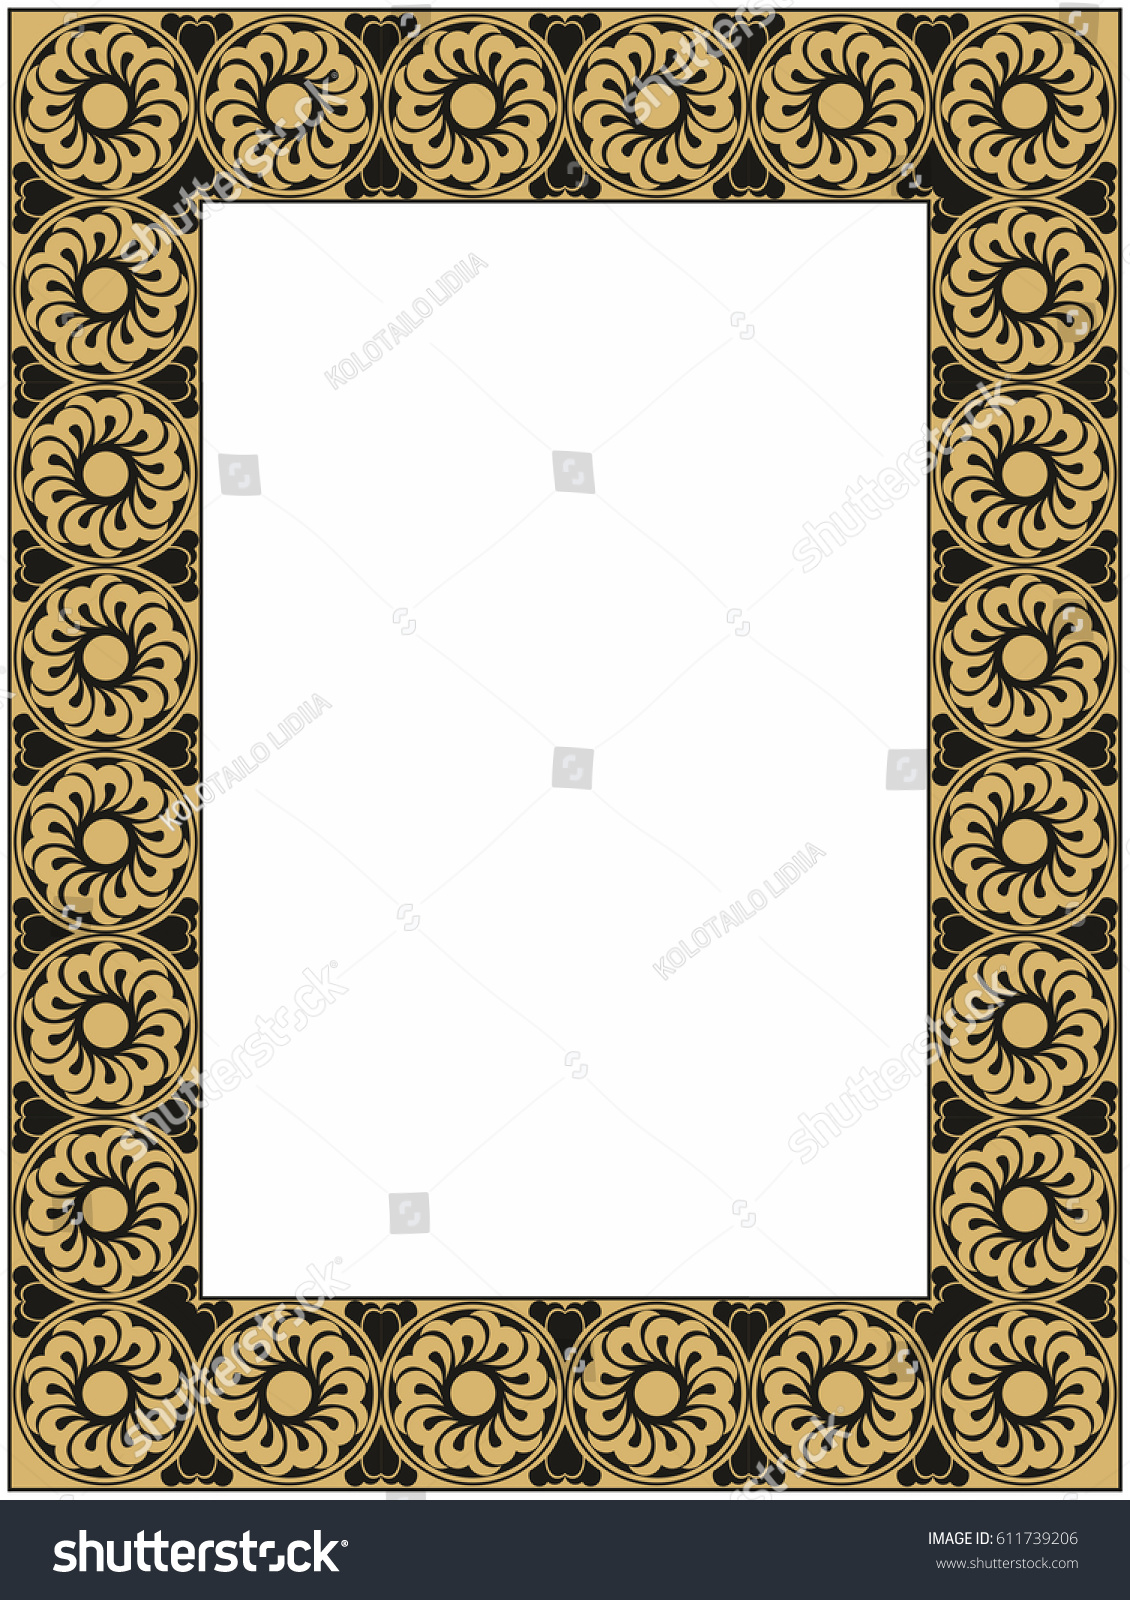 Gold black frame stock illustration 611739206 shutterstock gold and black frame jeuxipadfo Image collections